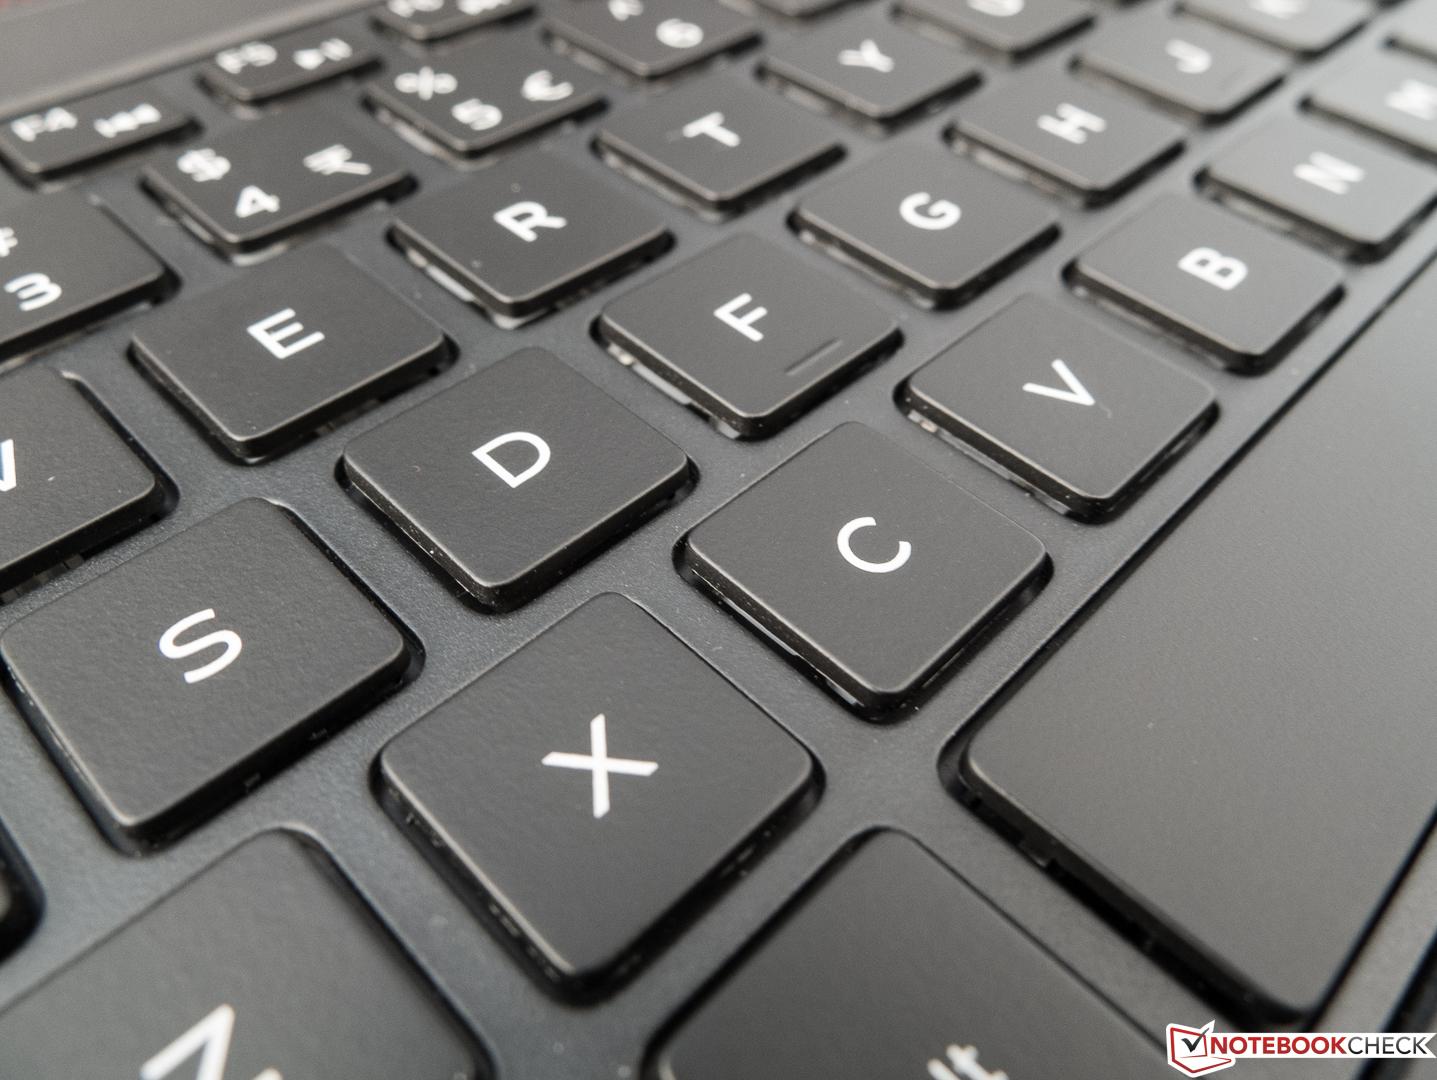 Dell Inspiron I7559 2512BLK Review   Inspiron 15 7559 Family    Reviewsbucket.com